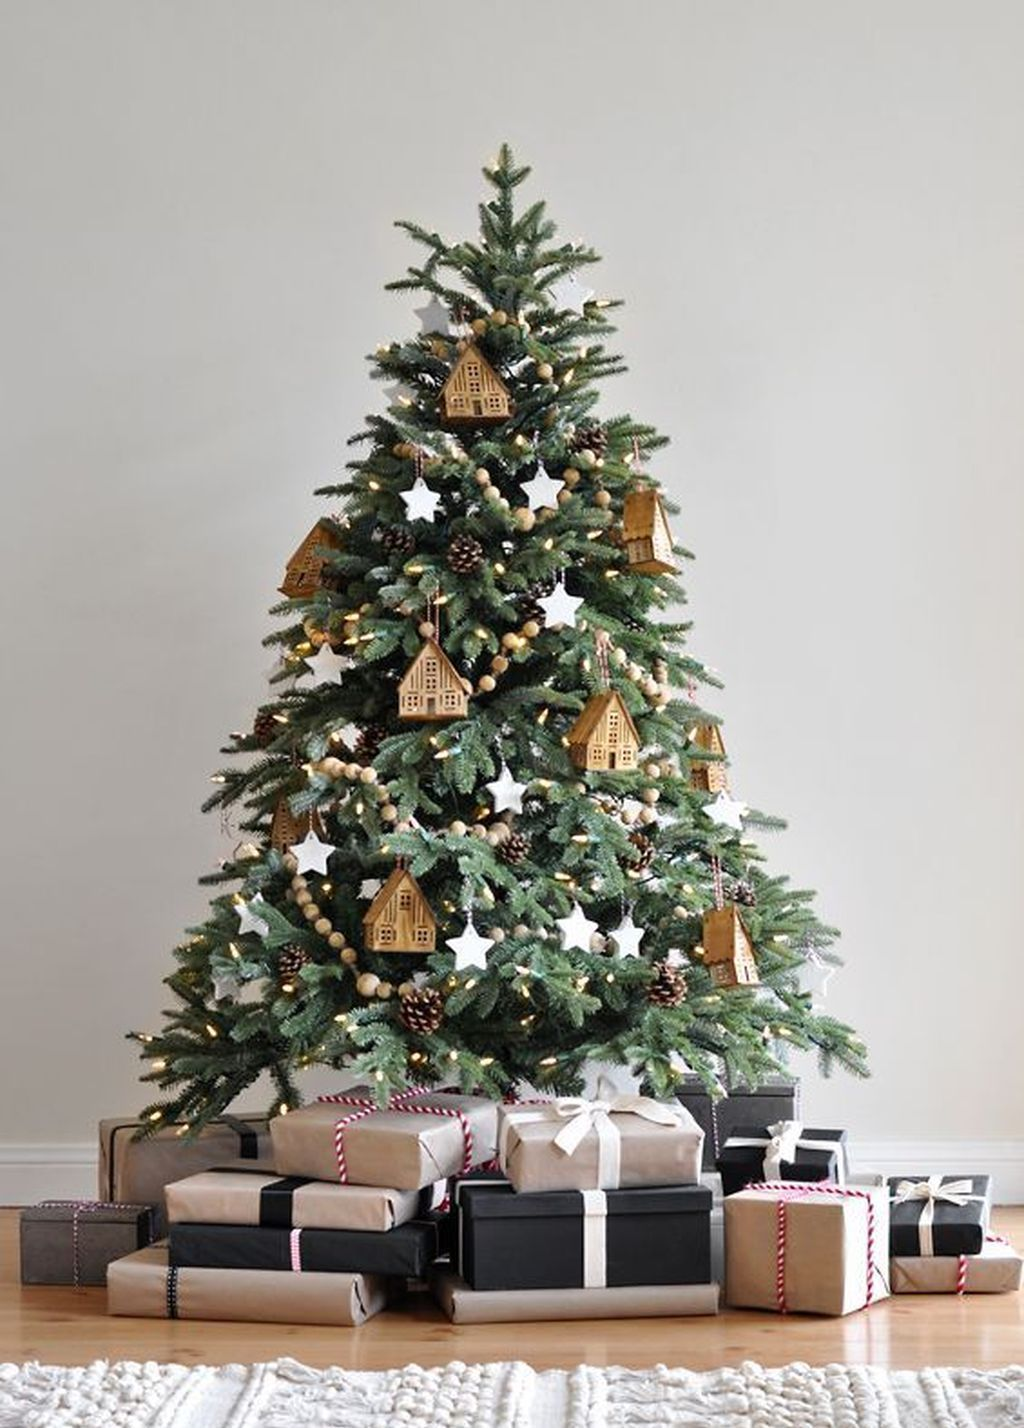 59 Simple Christmas Tree Decoration Ideas #ribbononchristmastreeideas